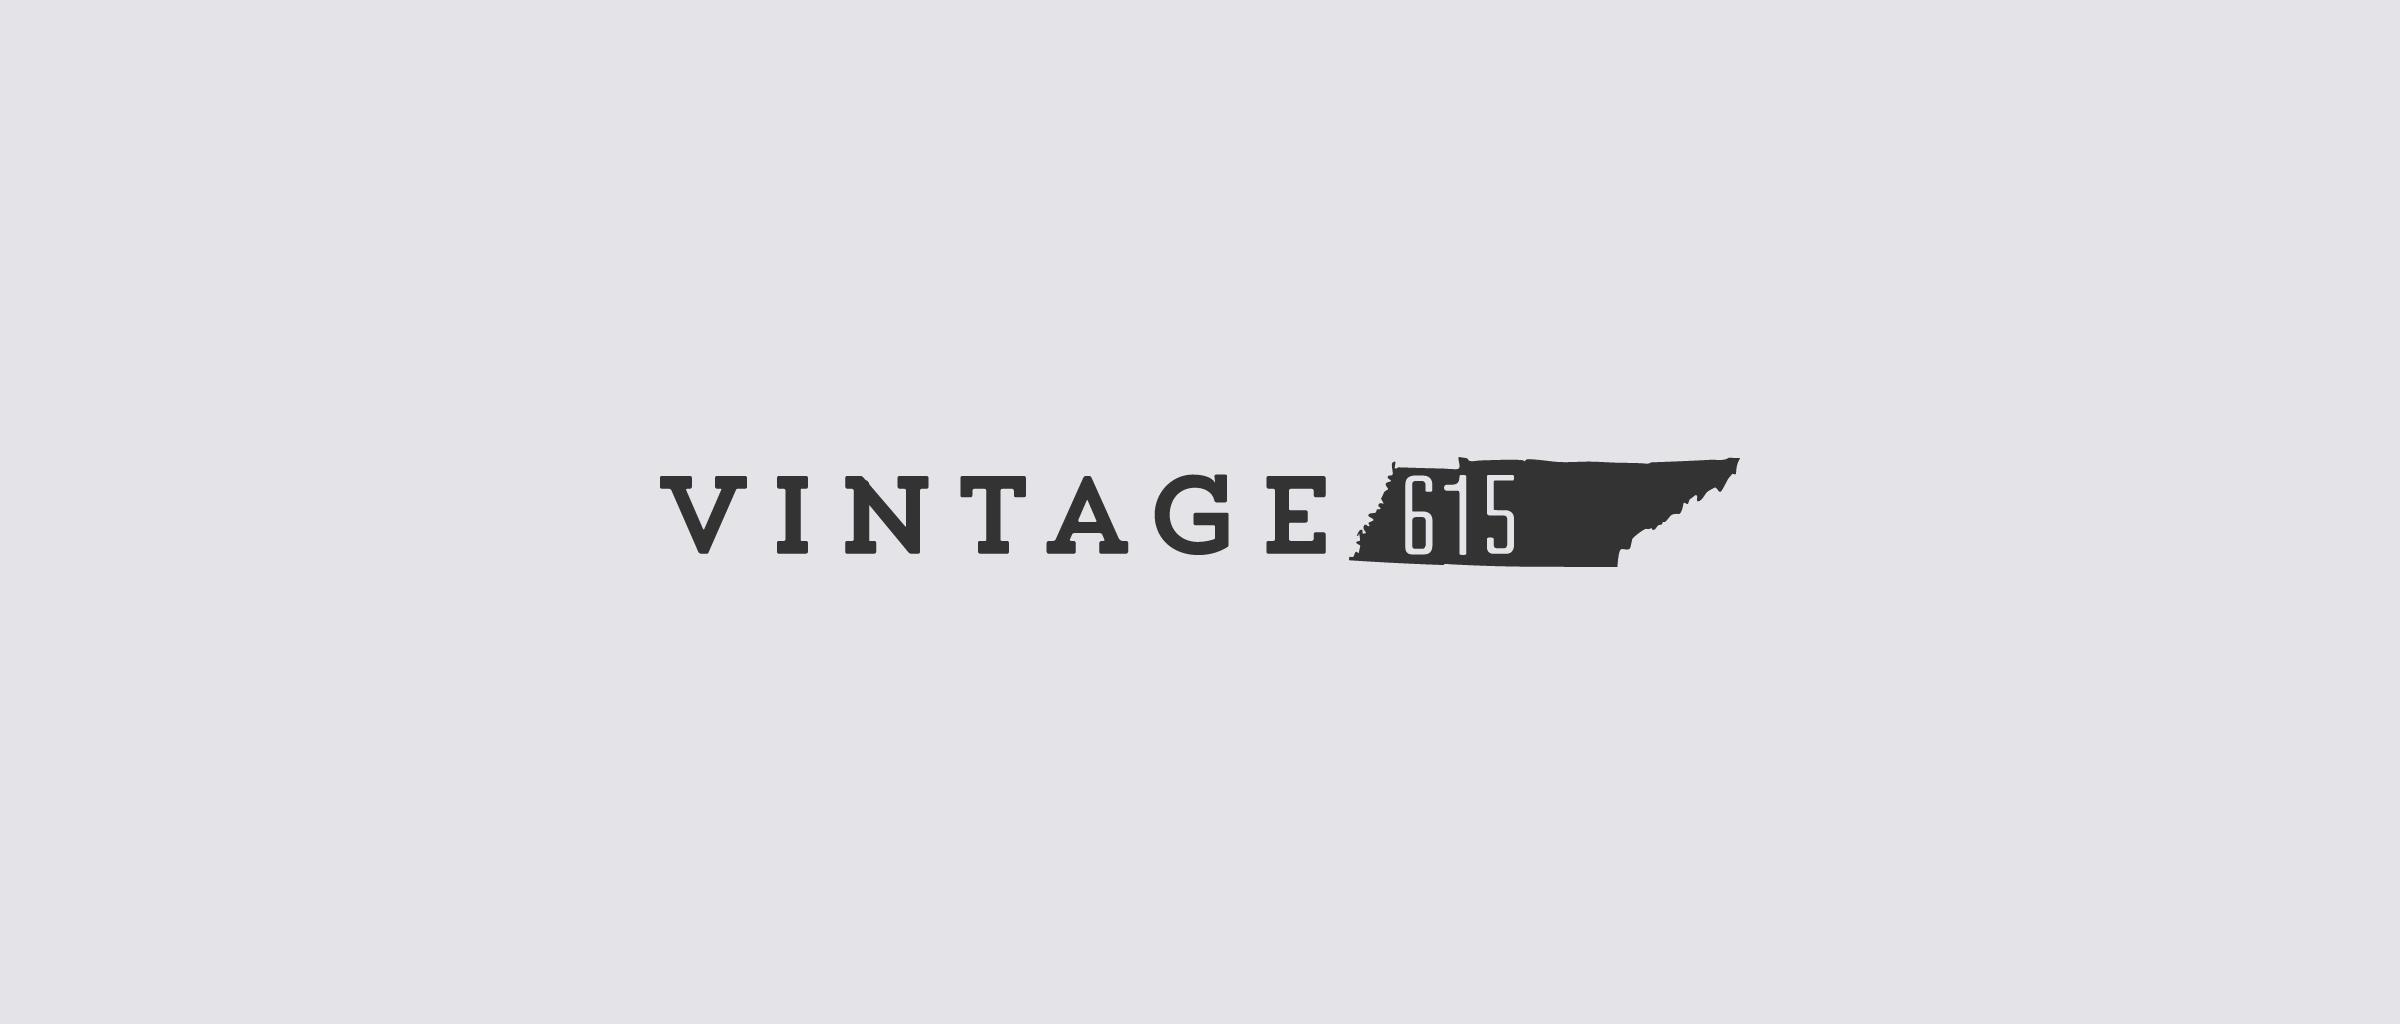 logo_vintage615_bw.png